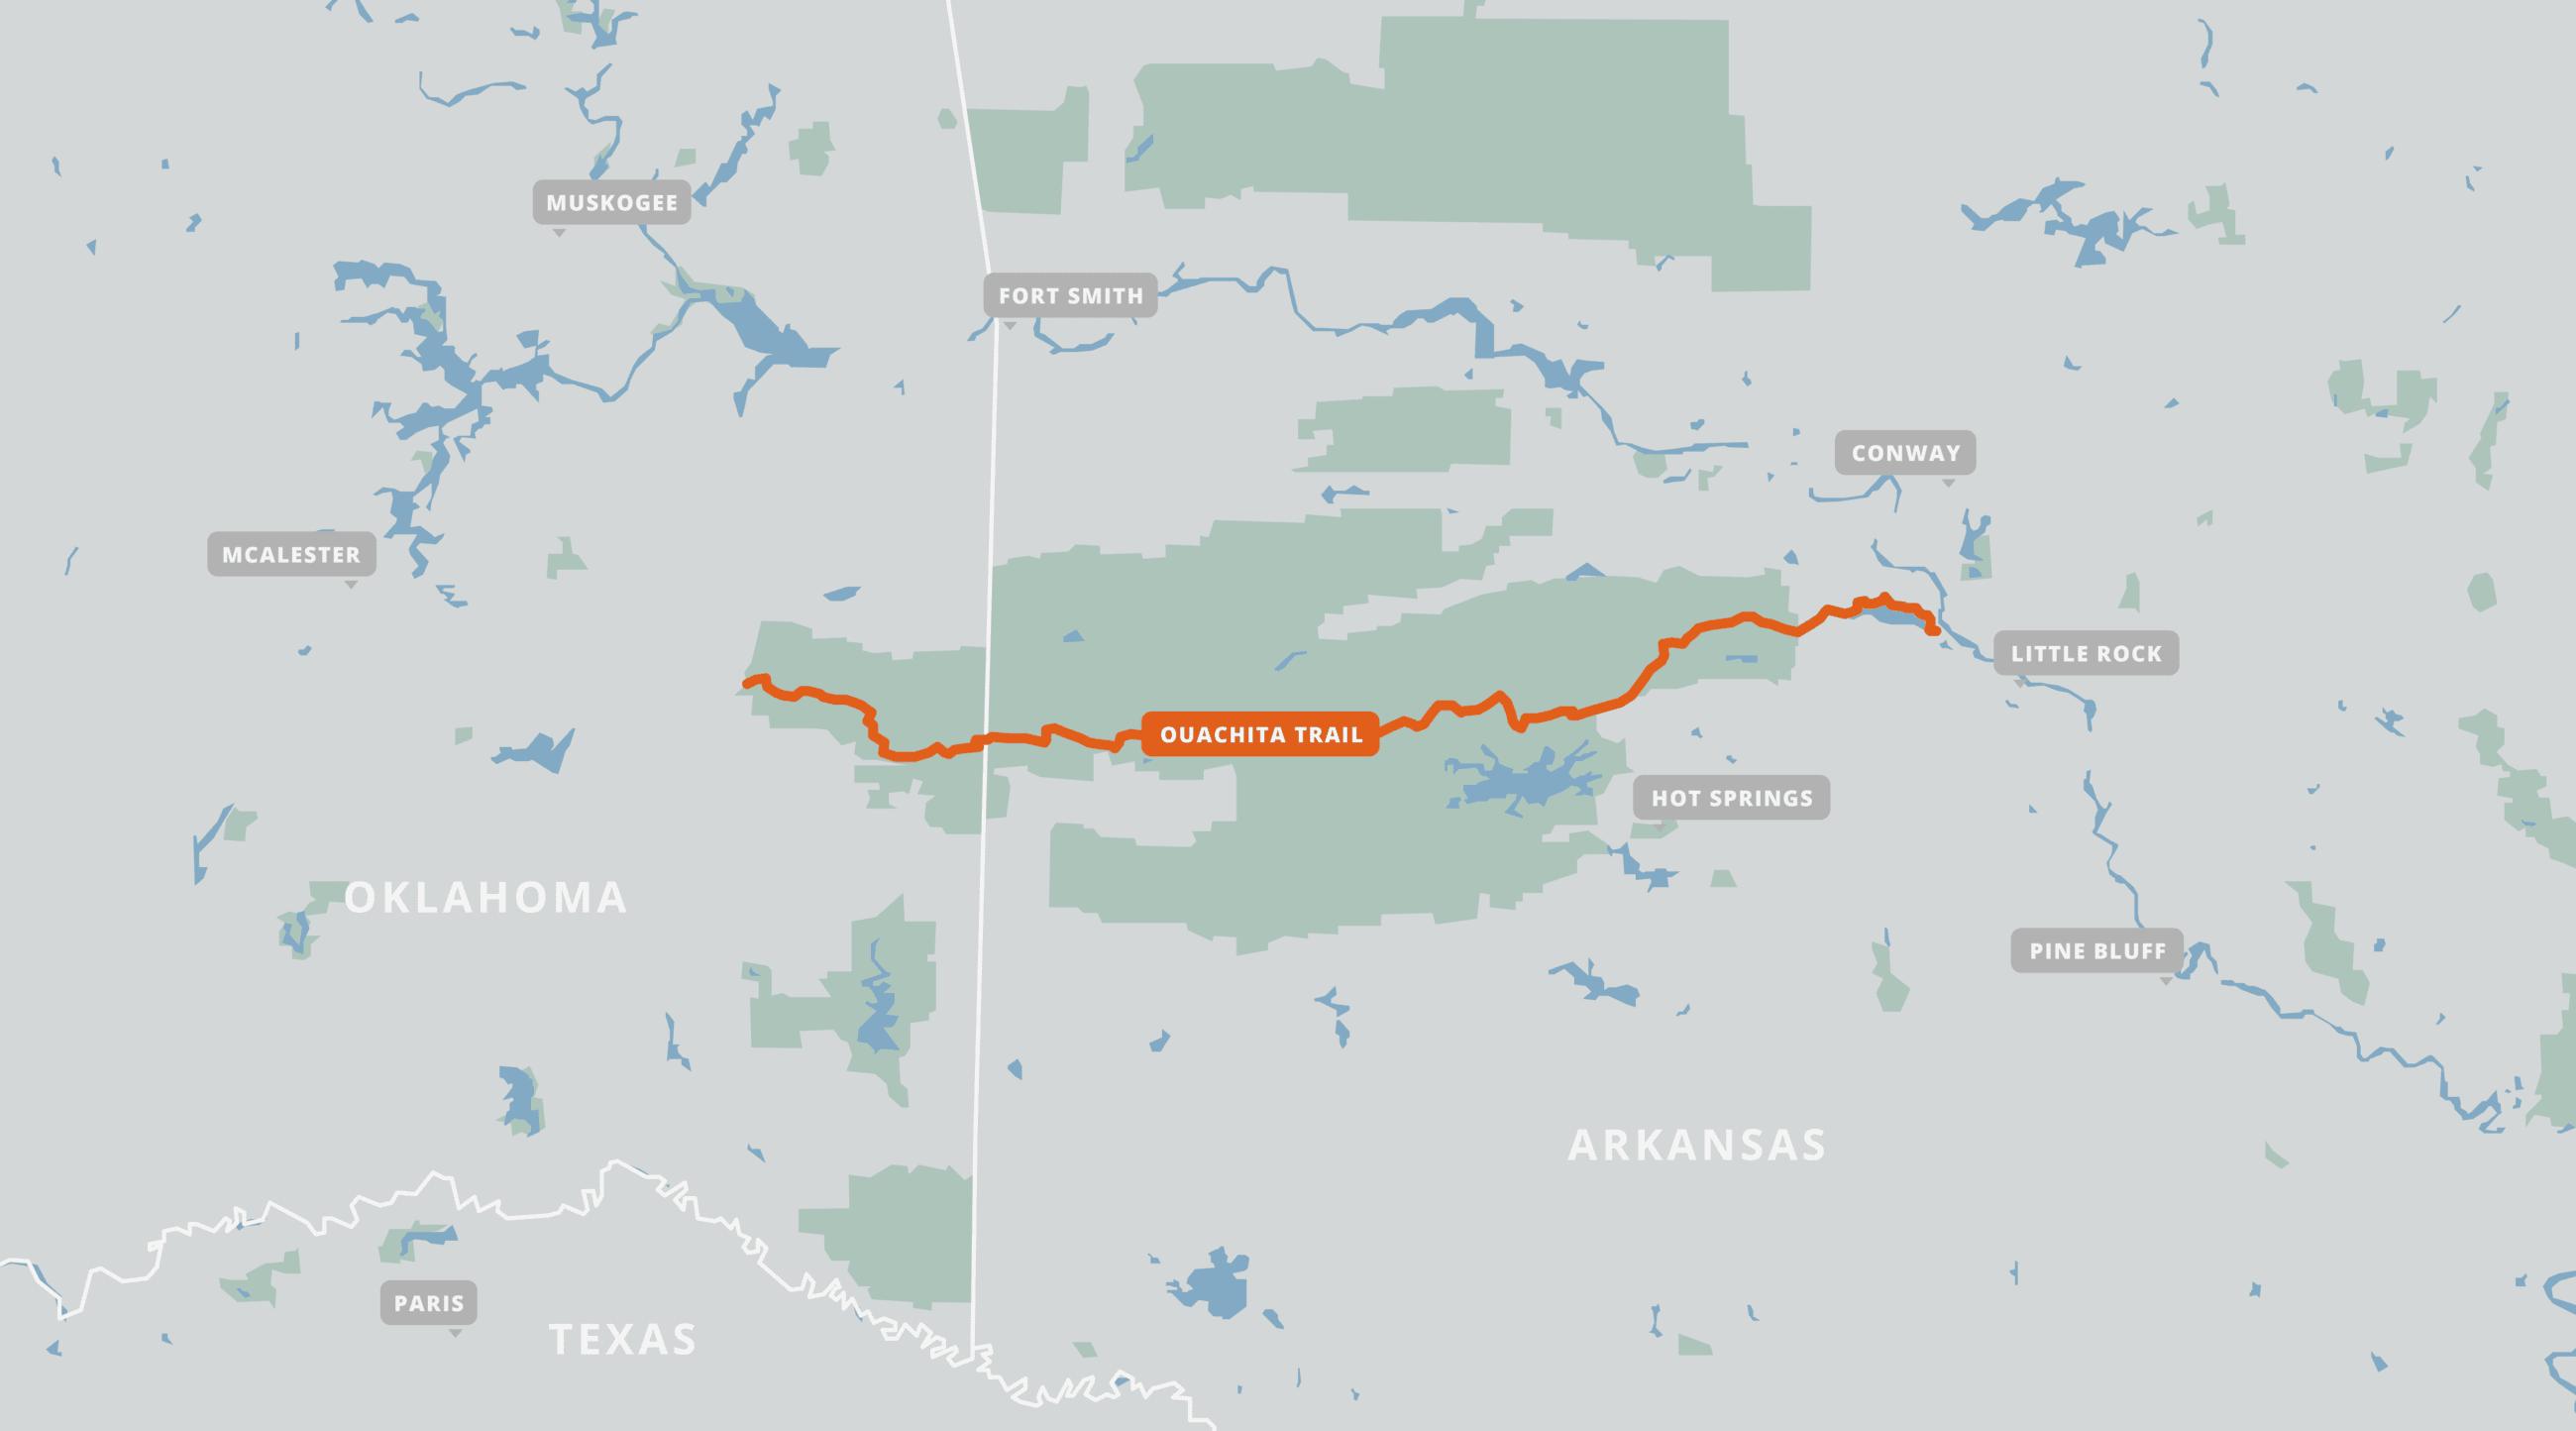 A map of the Ouachita Trail.